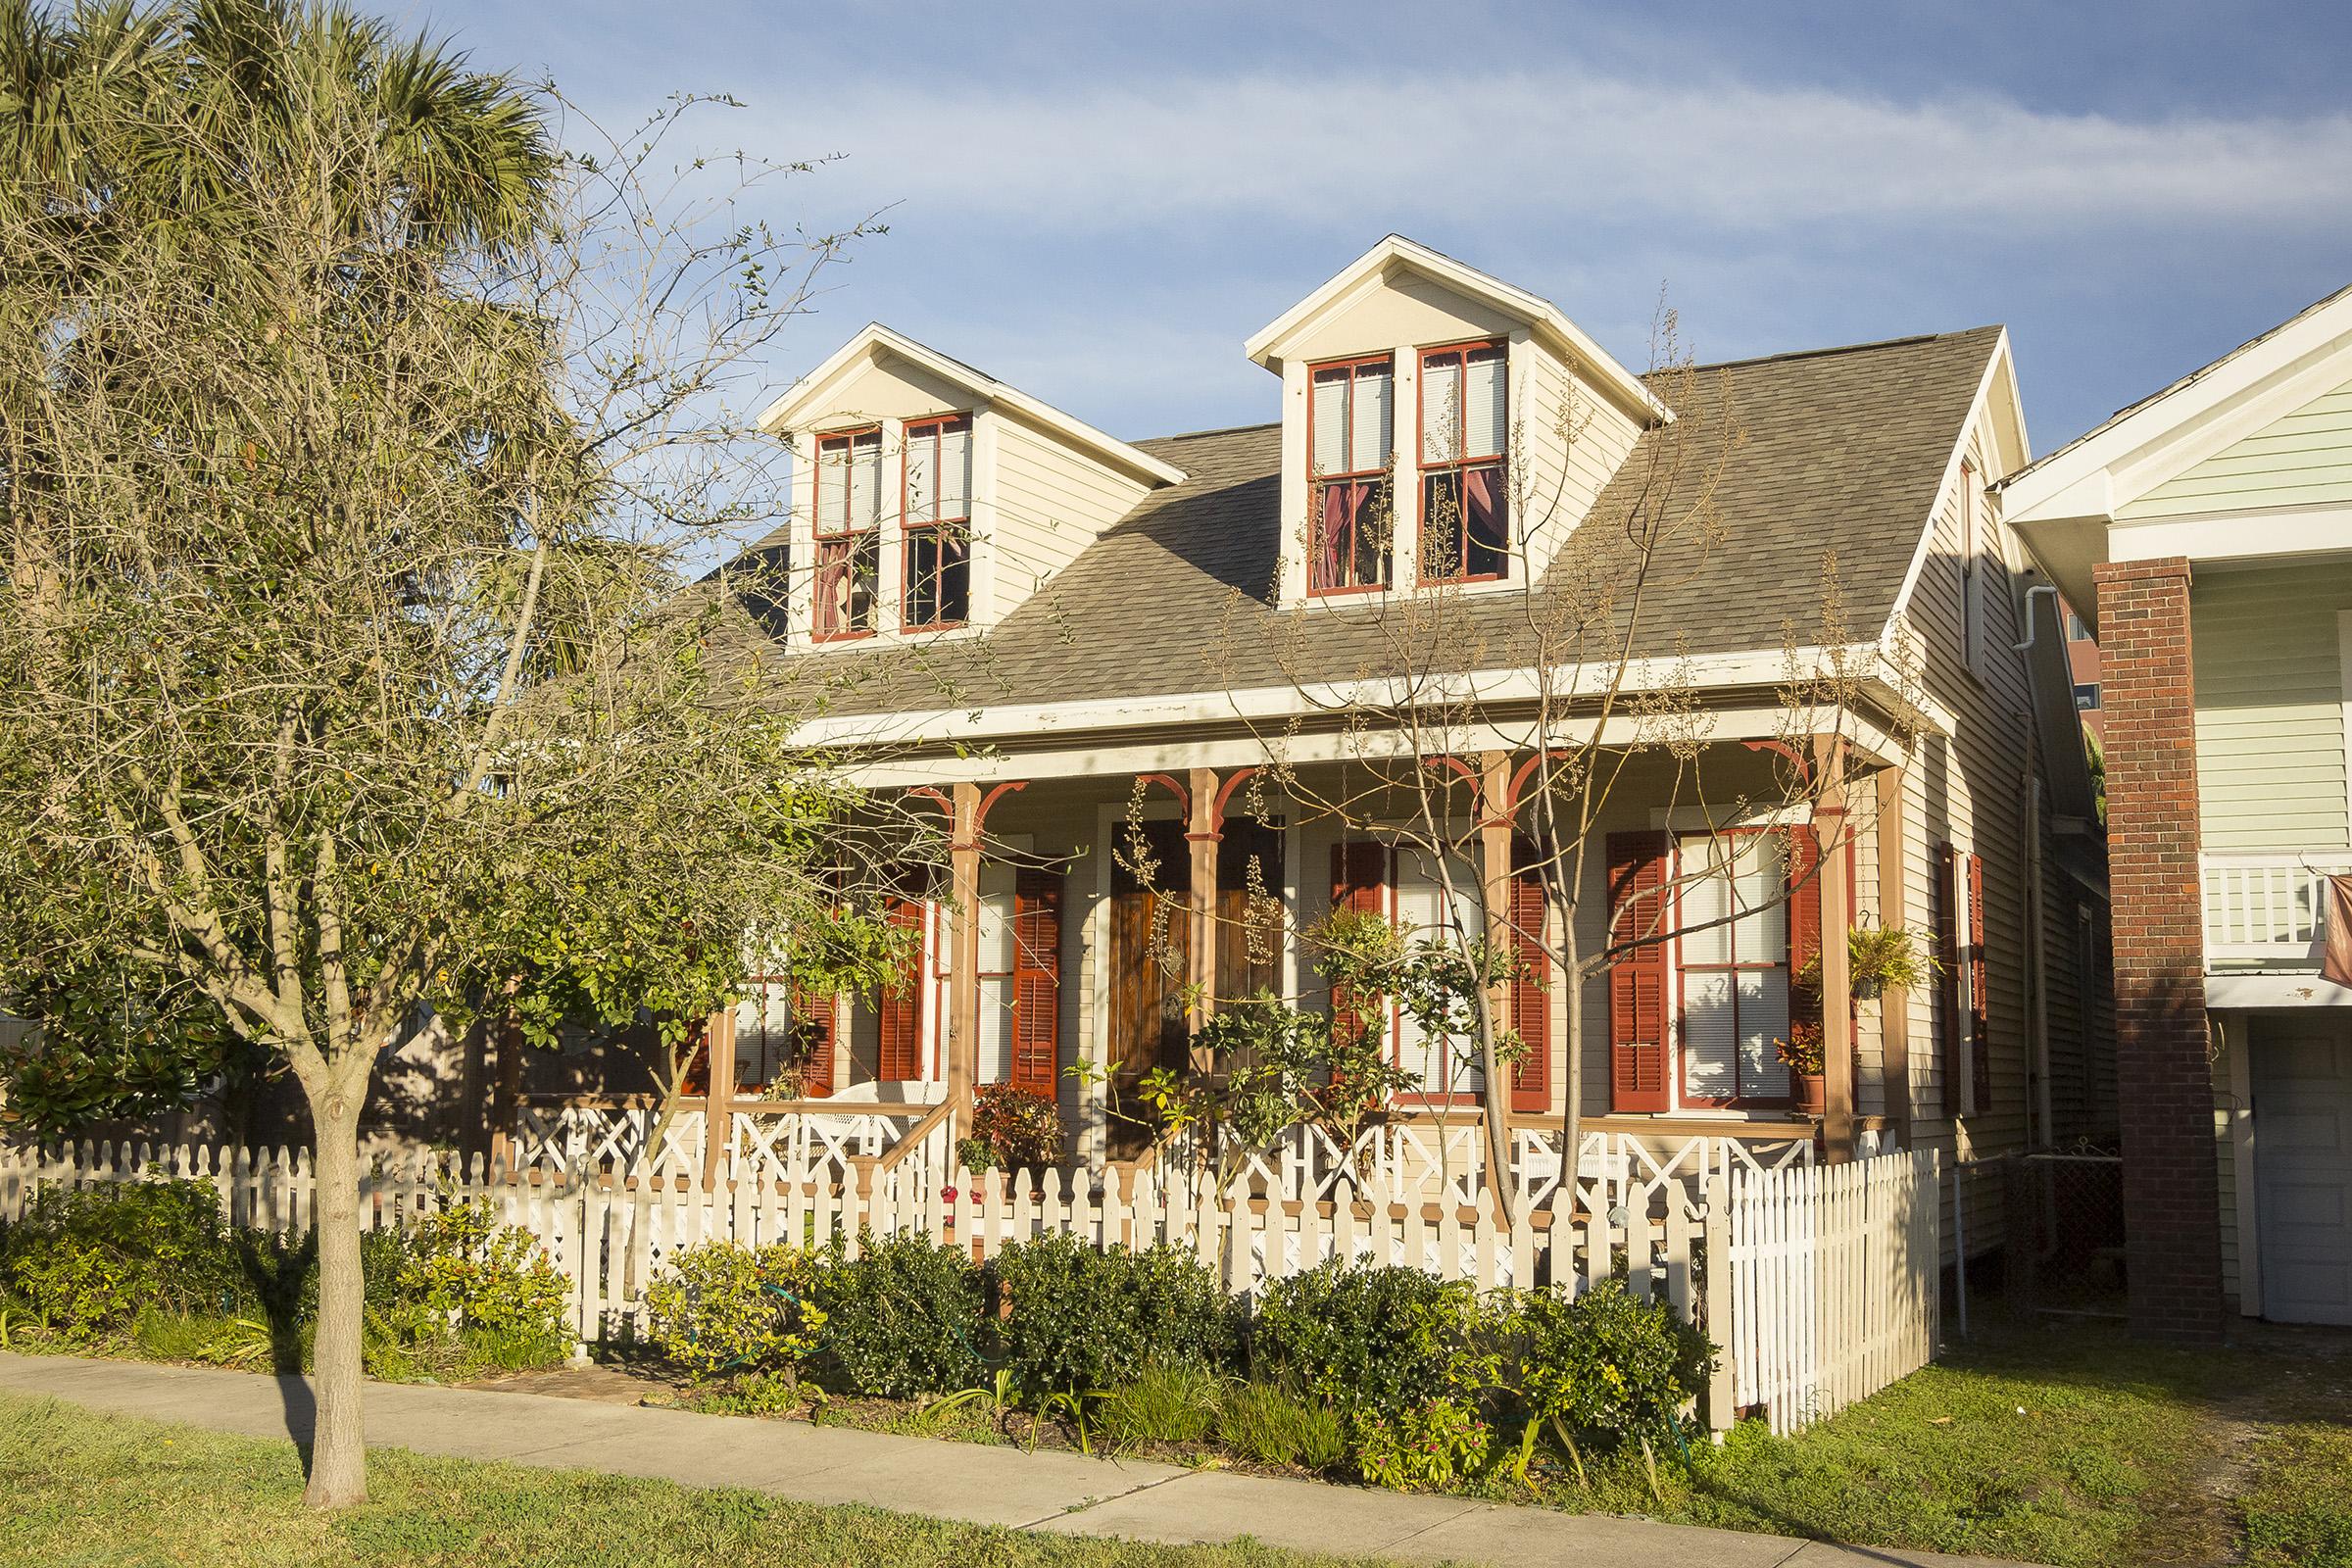 Galveston Historic Homes Tour Media Room Galveston